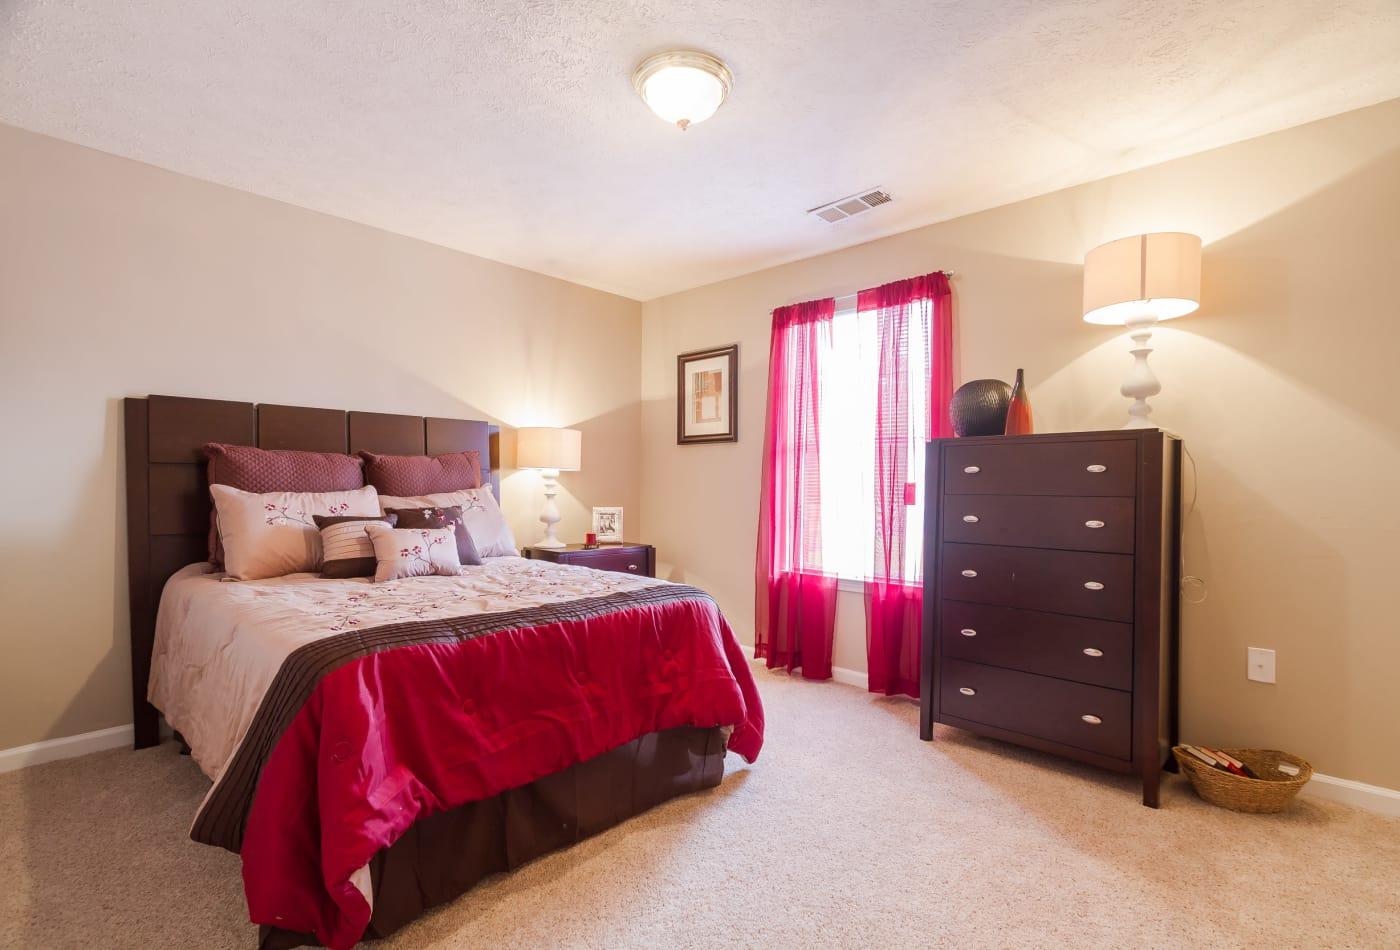 Mount Olive Townhomes master bedroom